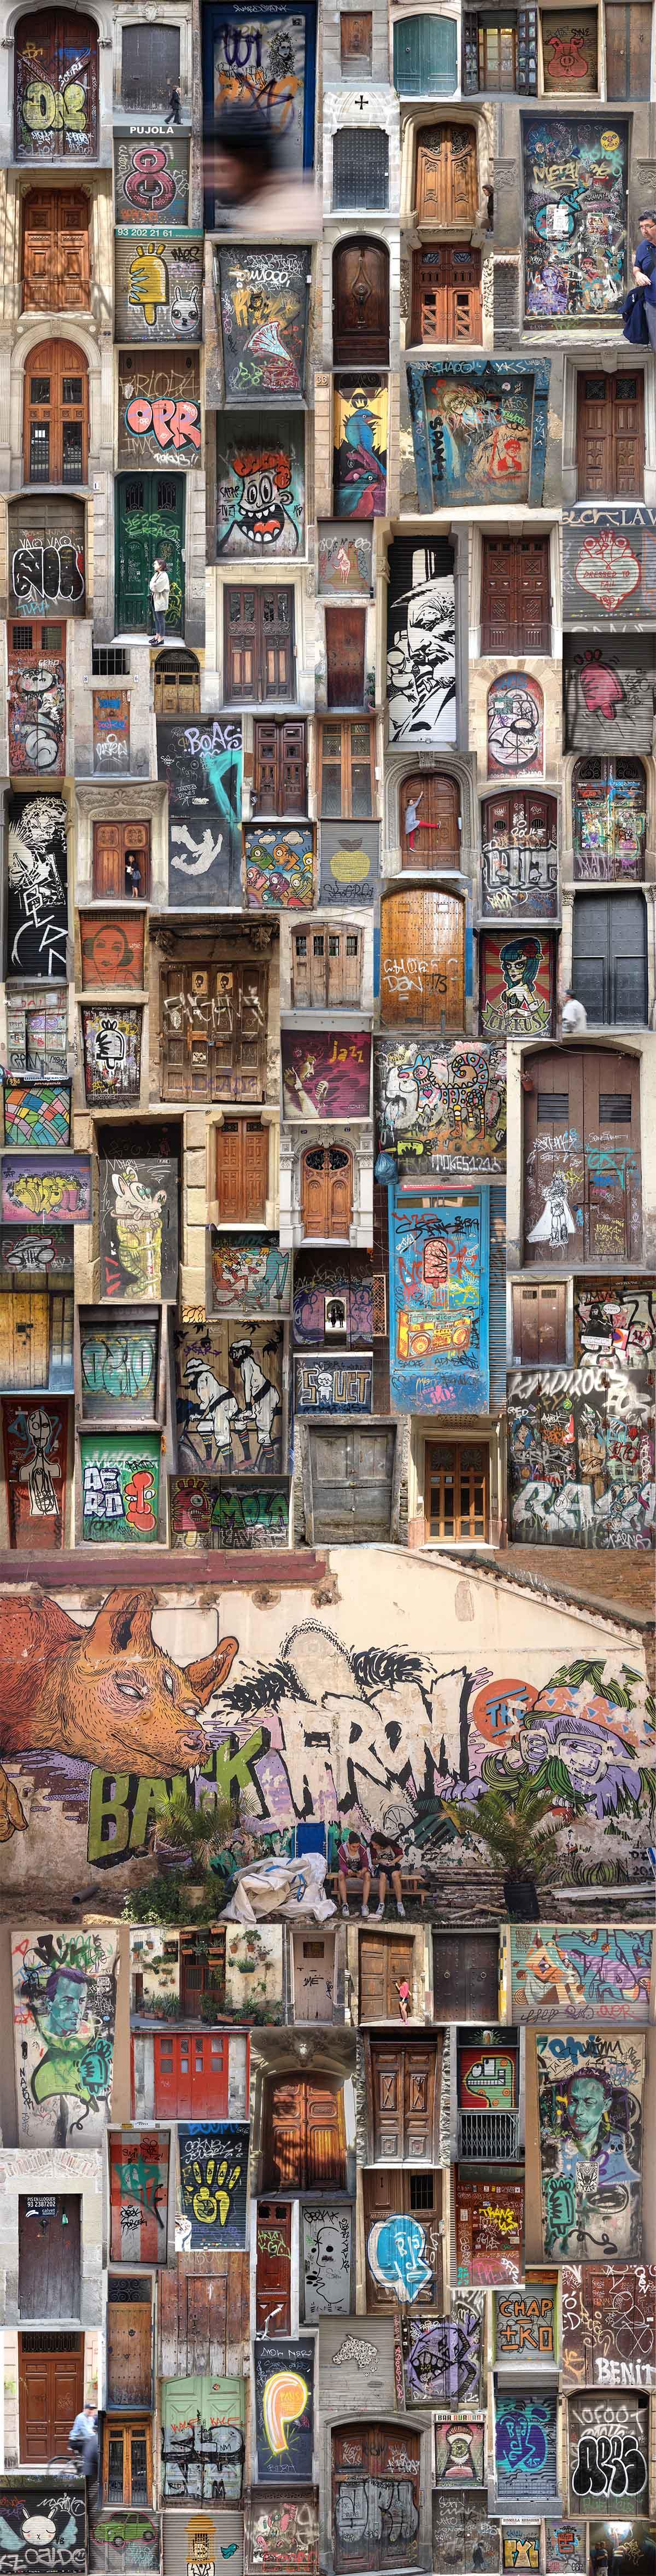 The amazing doors and street art of Barcelona